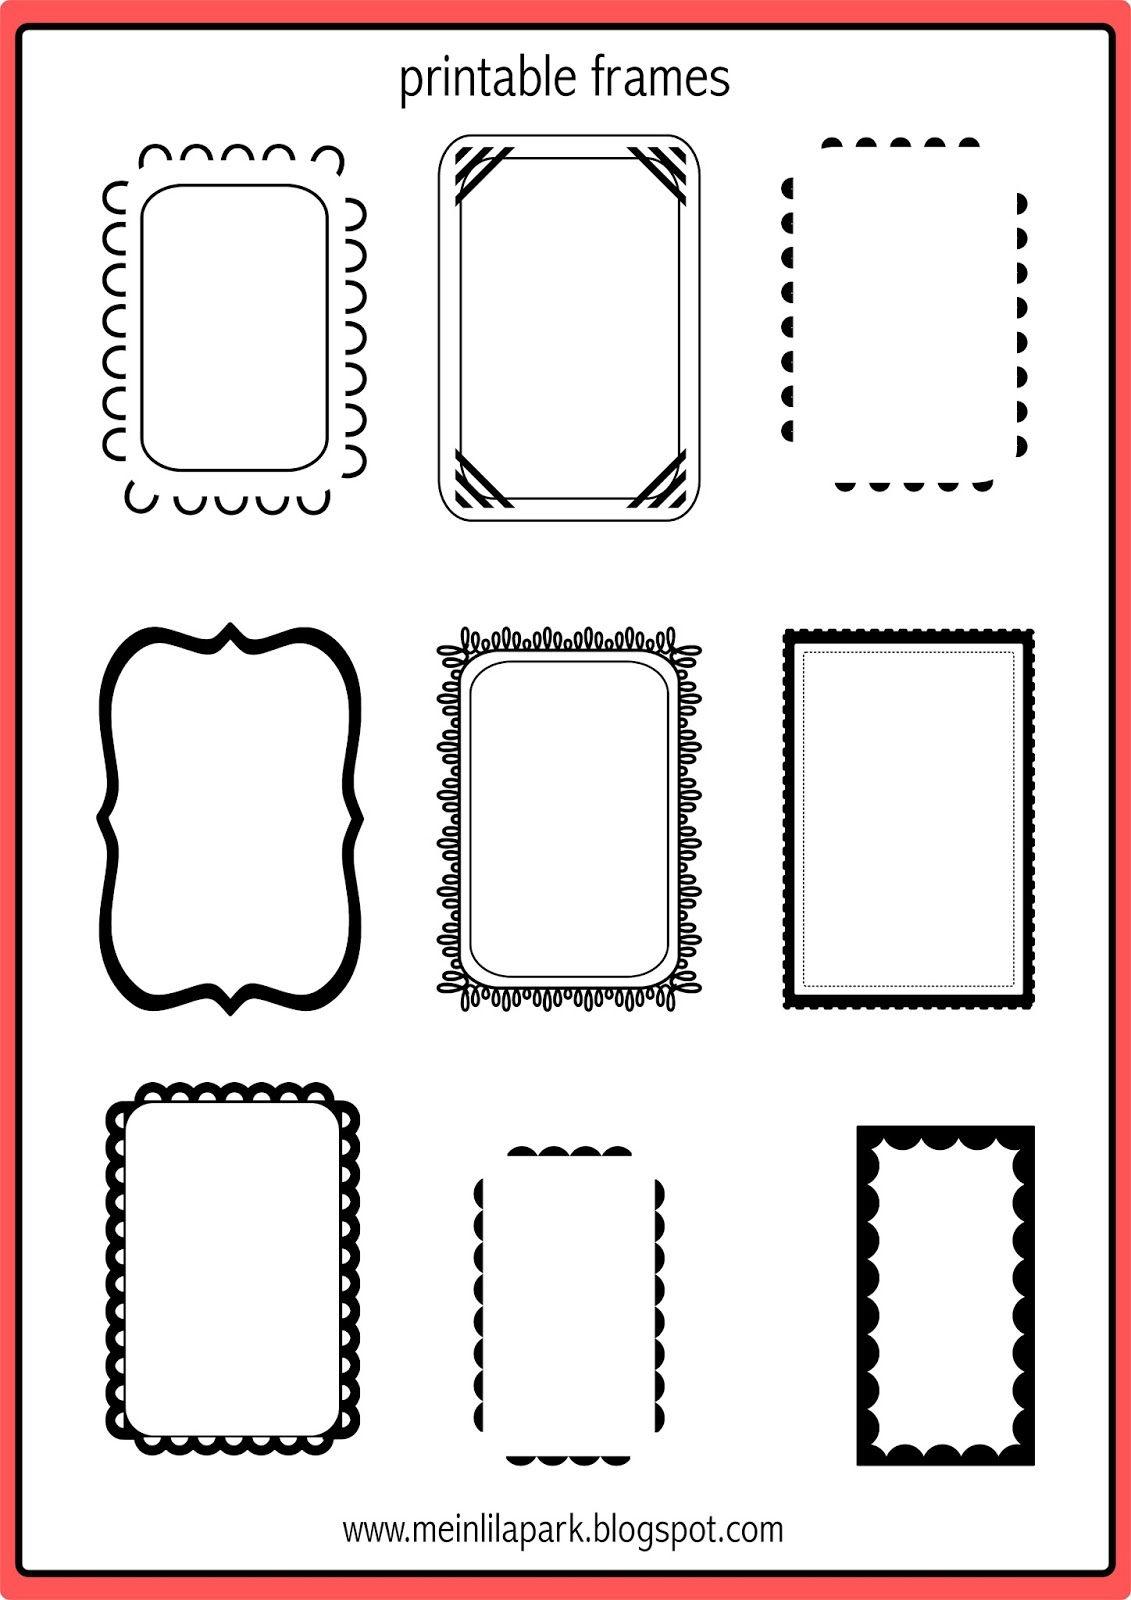 Free Printable Doodle Frames - Ausdruckbare Etiketten - Freebie - Free Printable Photo Frames